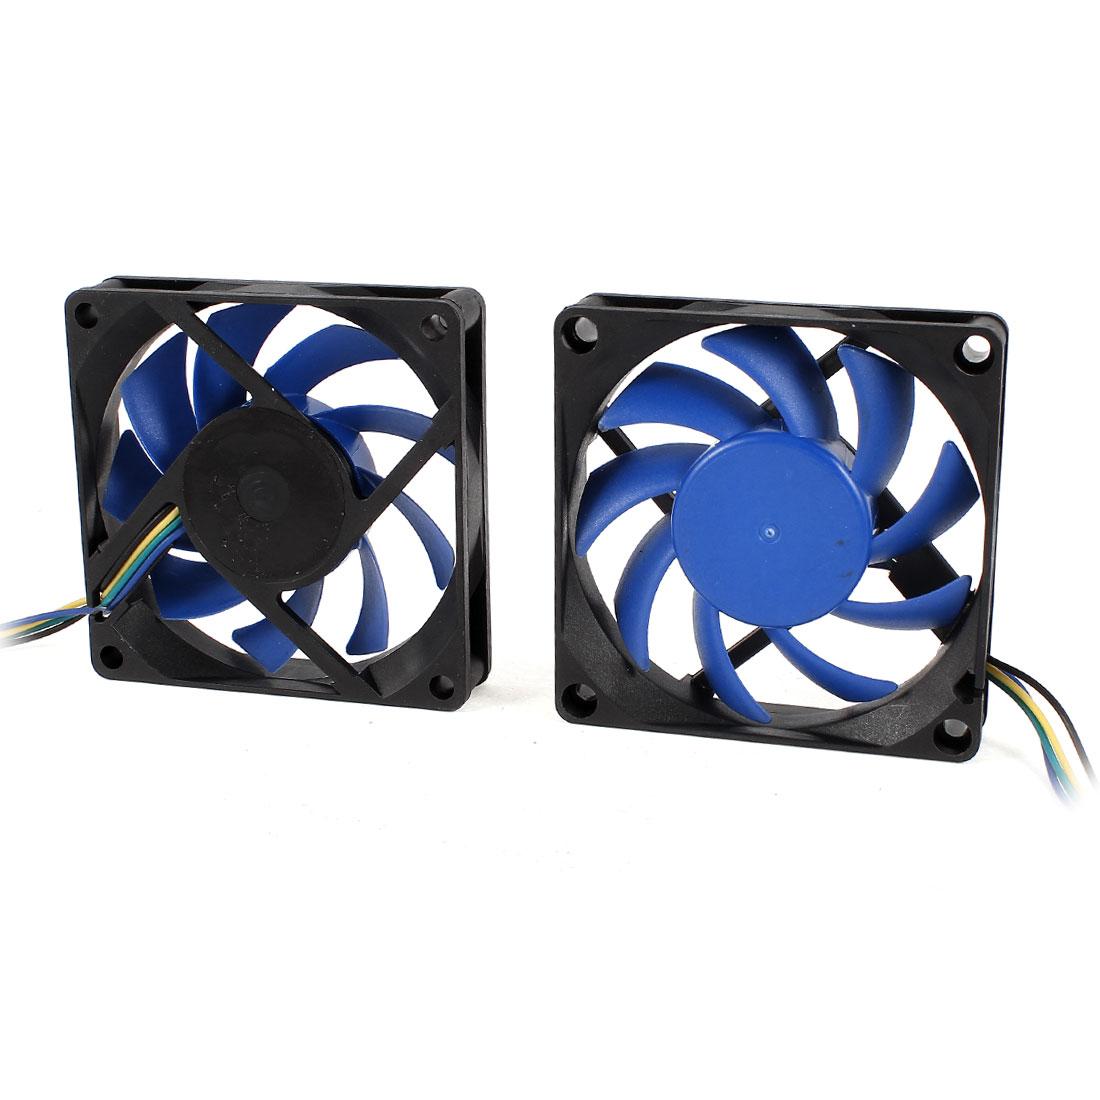 2 Pcs 70mm x 15mm 12V 4 Pins PWM PC Computer Case CPU Cooler Cooling Fan Black Blue